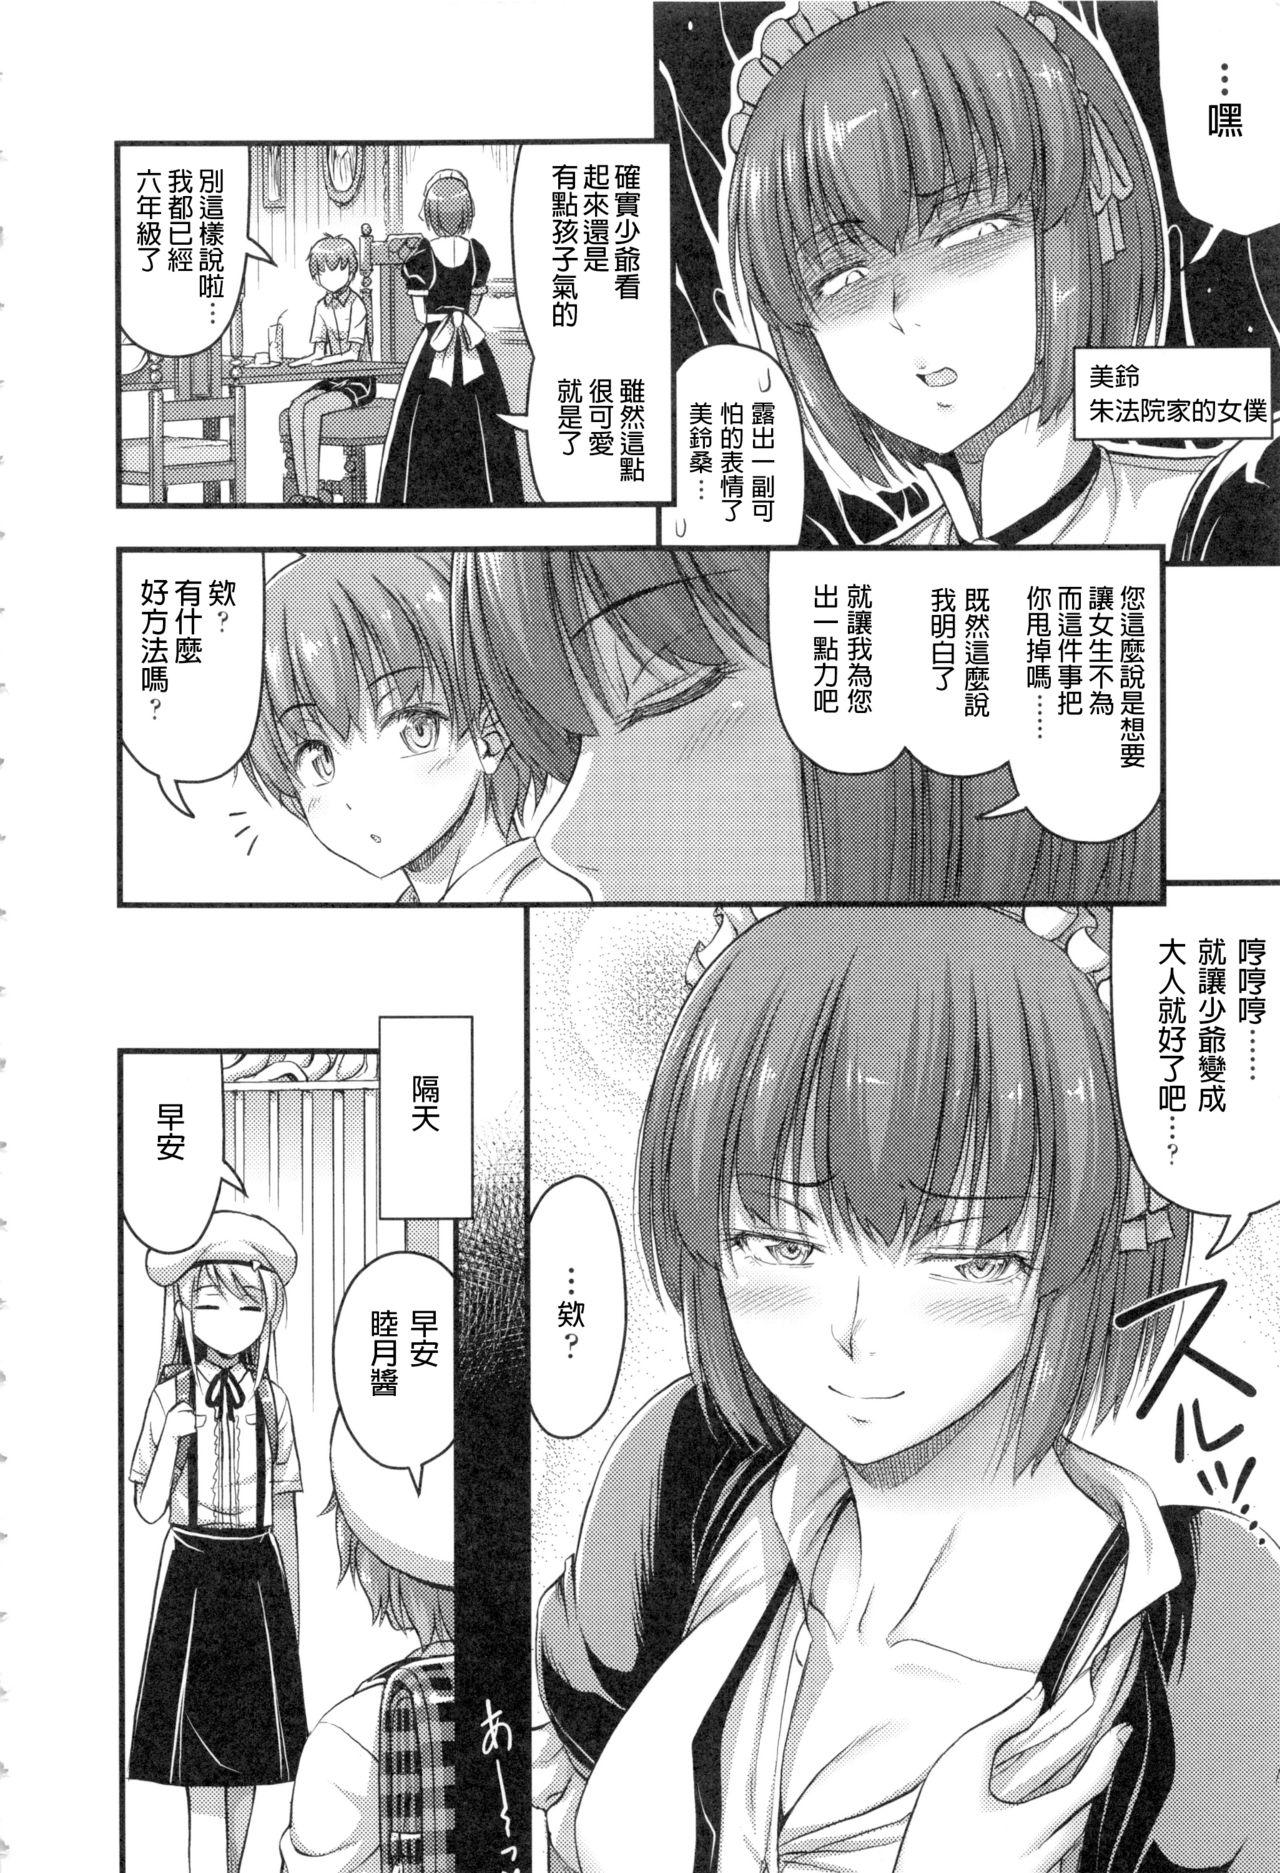 Onii-chan Sonna ni Short Pants Suki nano? 141